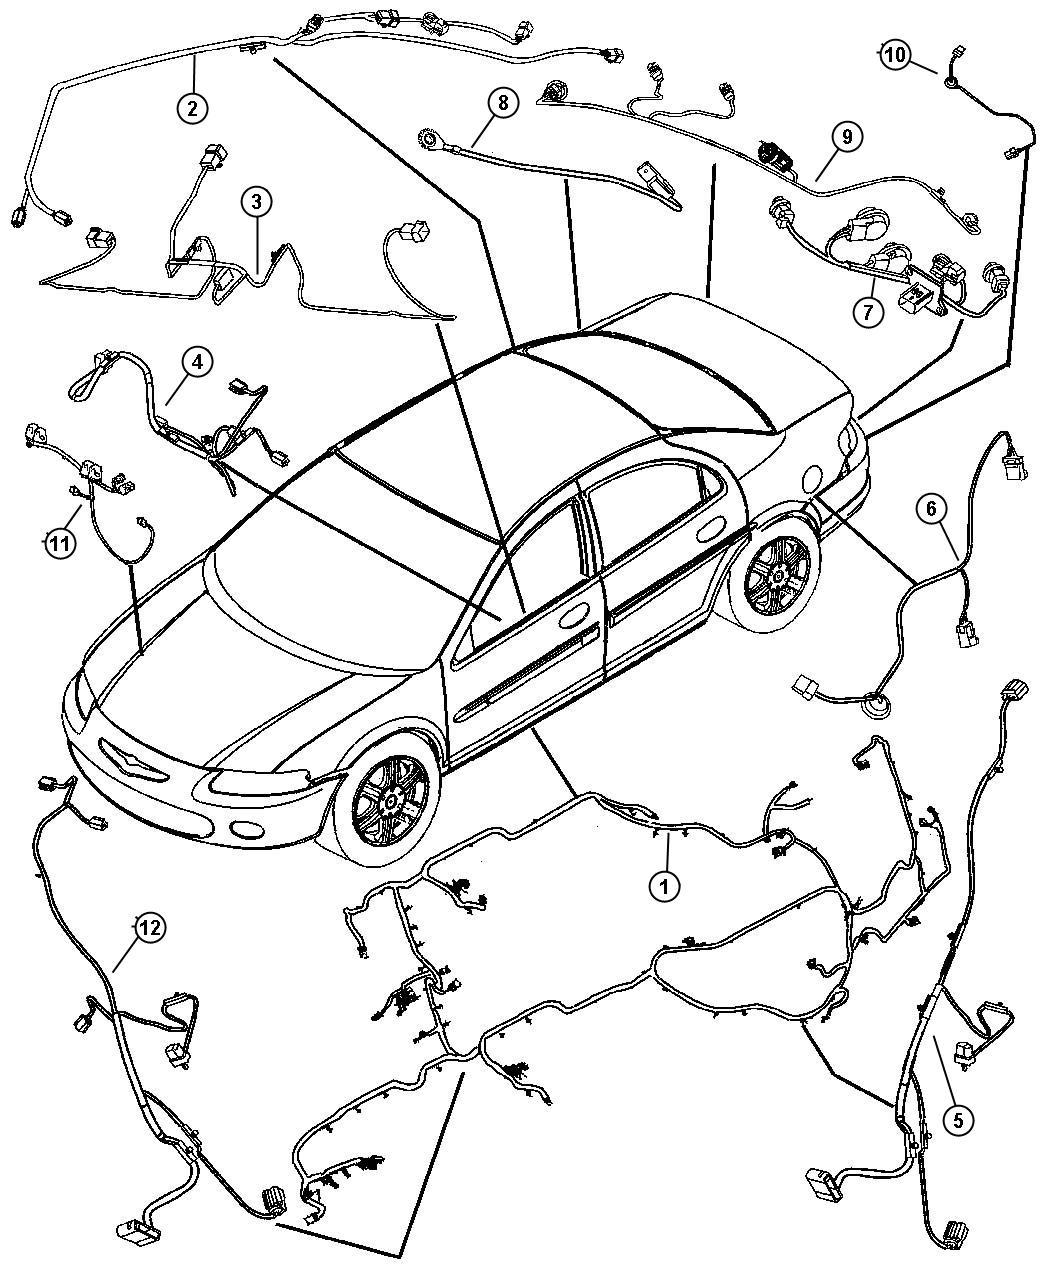 Chrysler Sebring Wiring. Unified body. Radioside ...